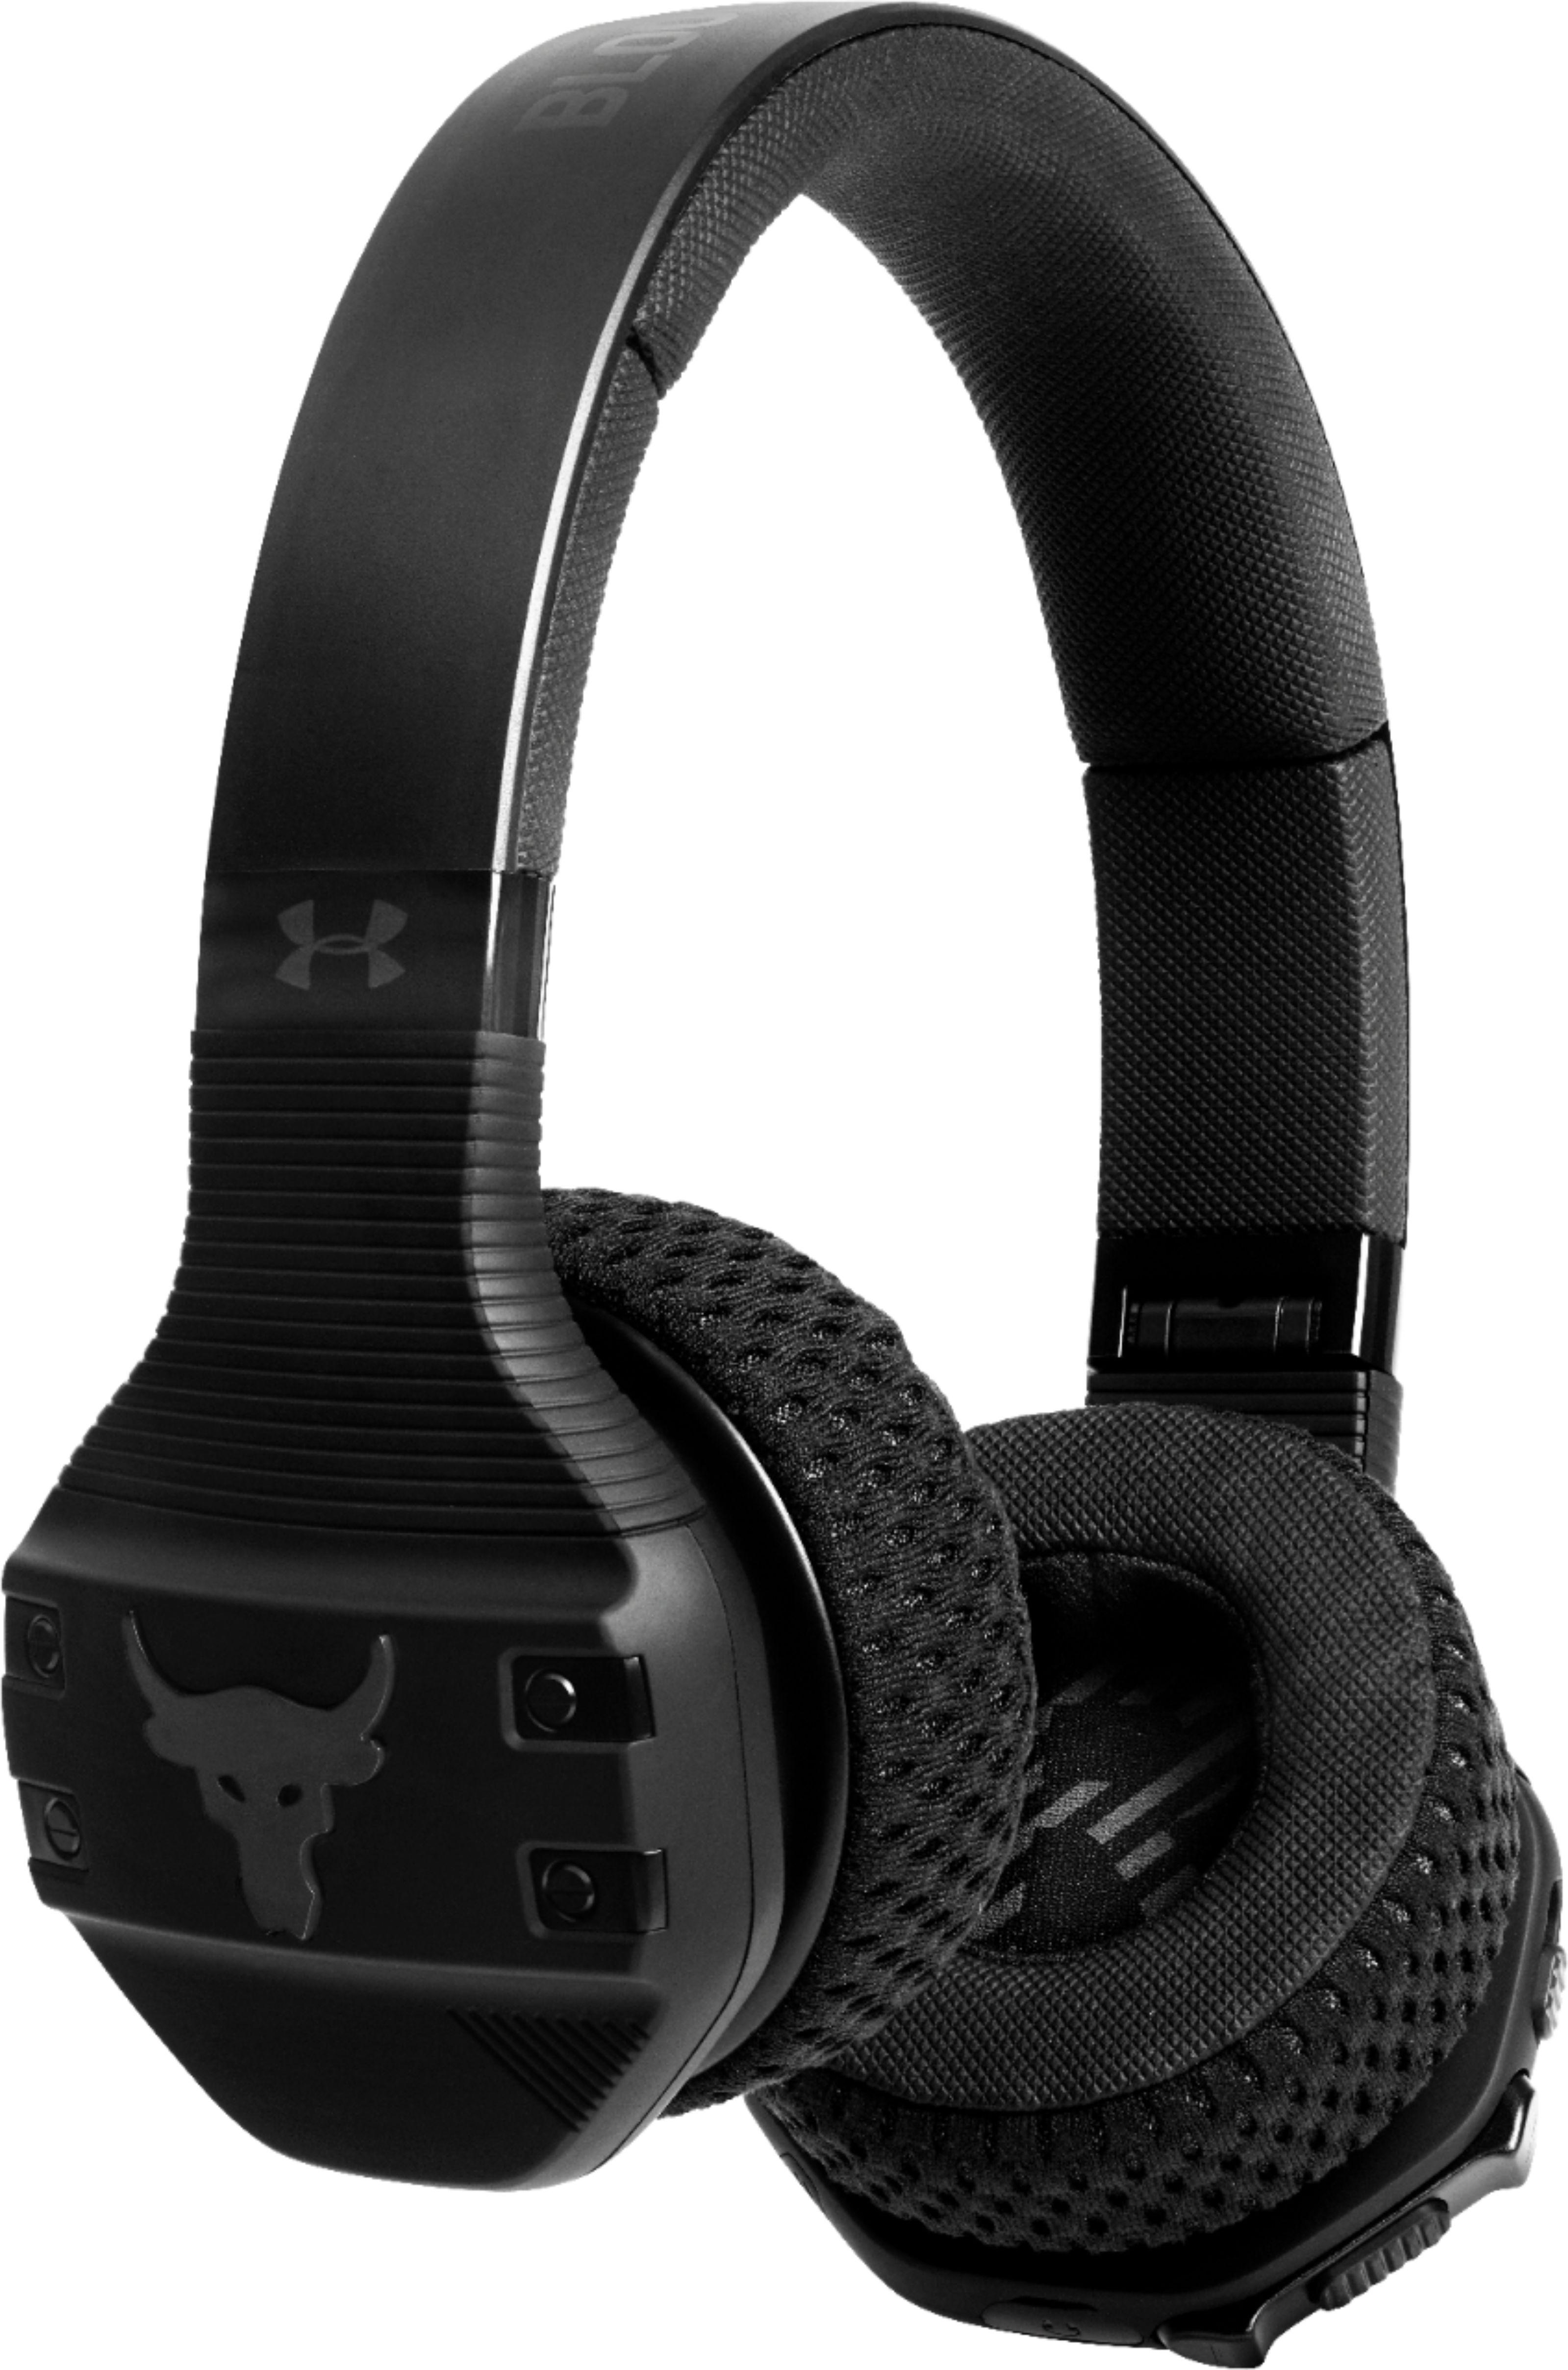 Best Buy Under Armour Sport Wireless Train OnEar Headphones Project Rock Edition Black